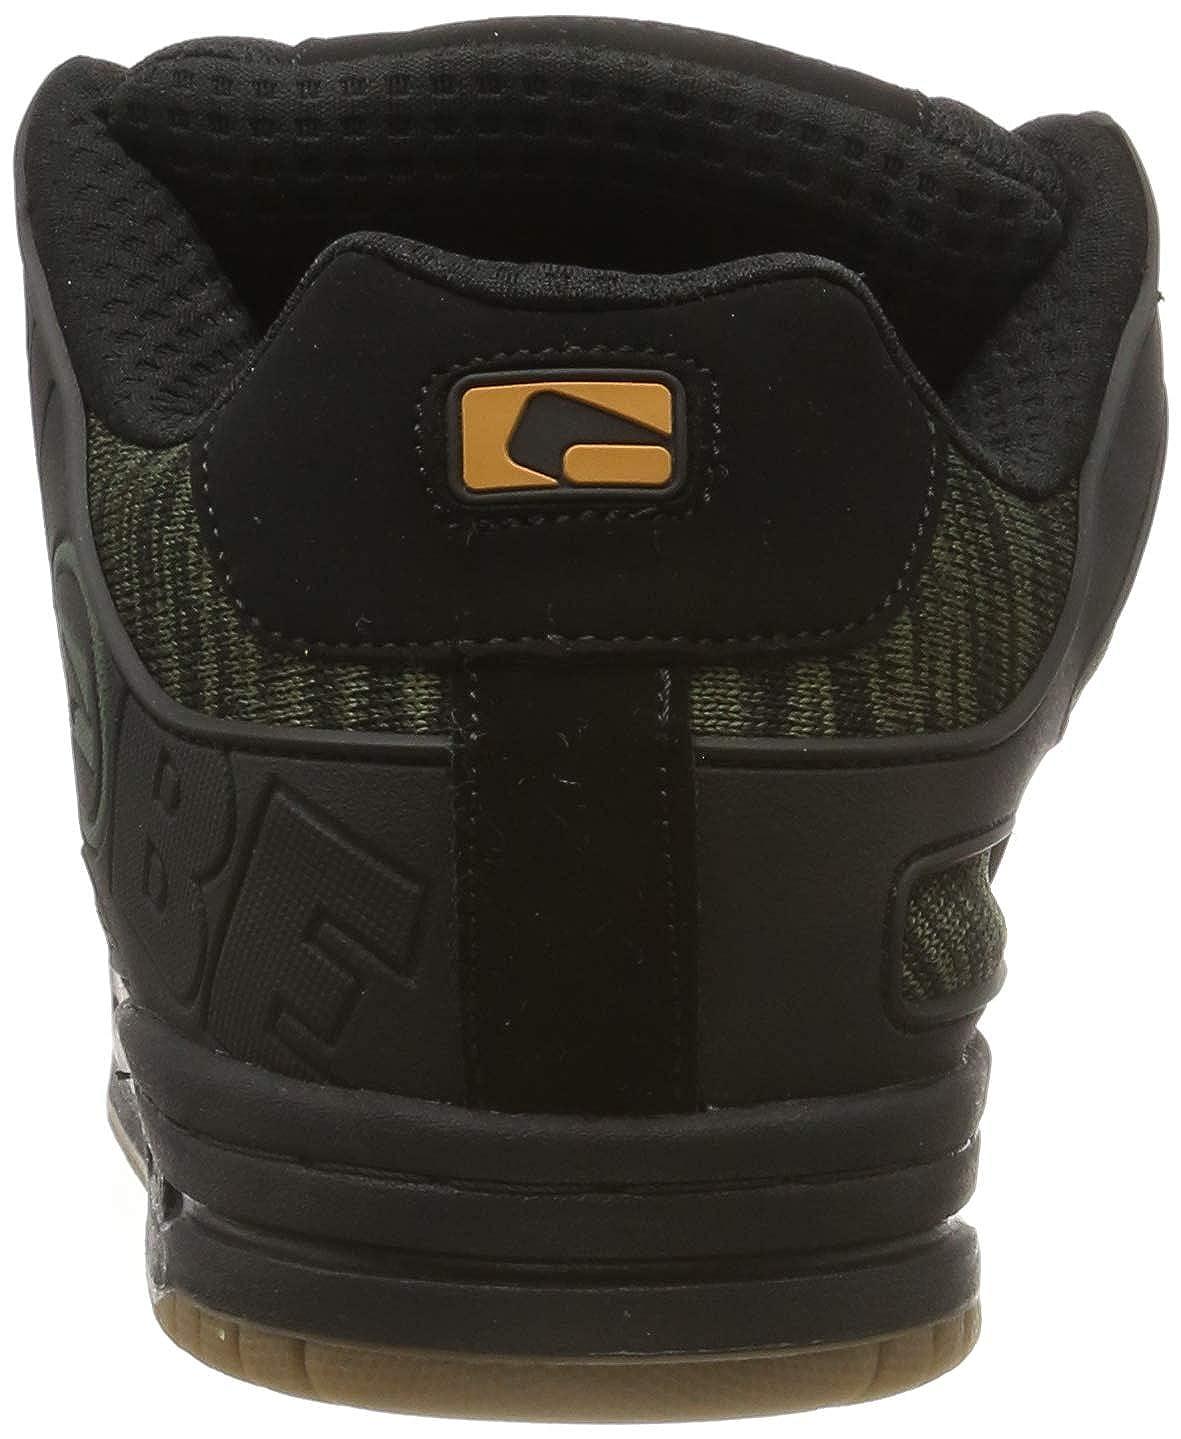 Noir 6.5 US Globe Tilt Chaussures de Skateboard Homme - 38.5 EU Black//Olive Knit 20421